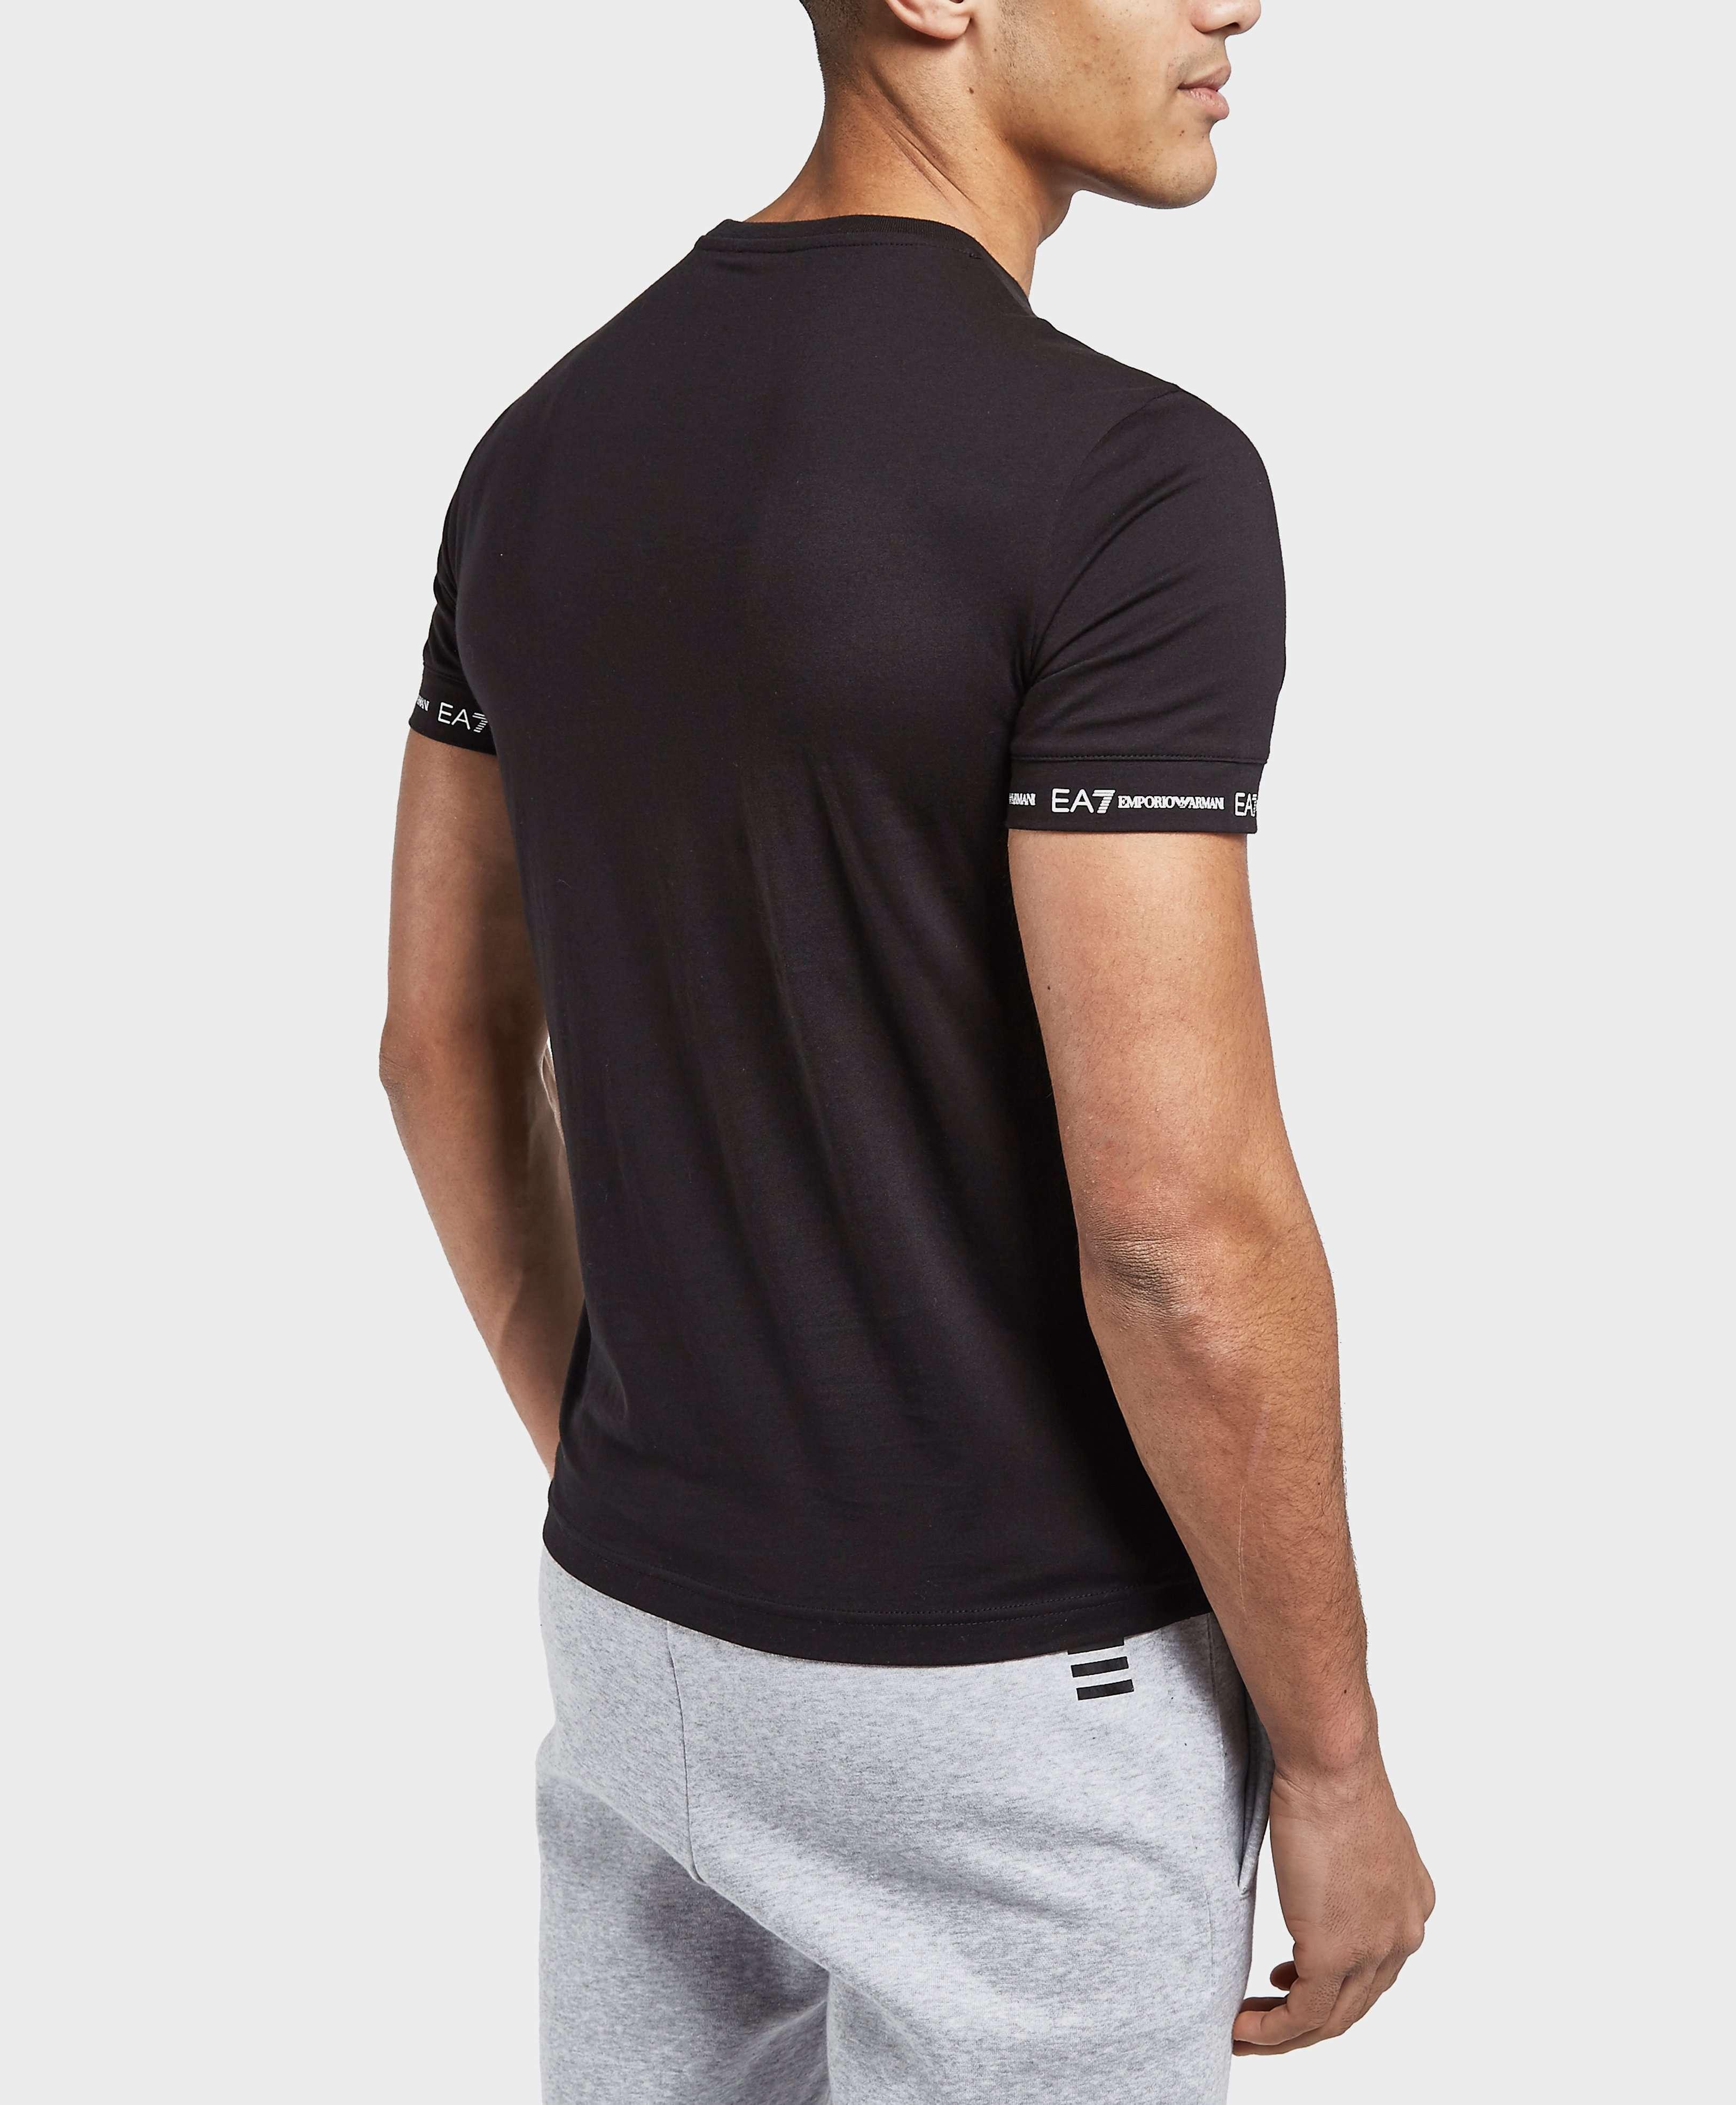 Emporio Armani EA7 Sleeve Branded Short Sleeve T-Shirt - Exclusive